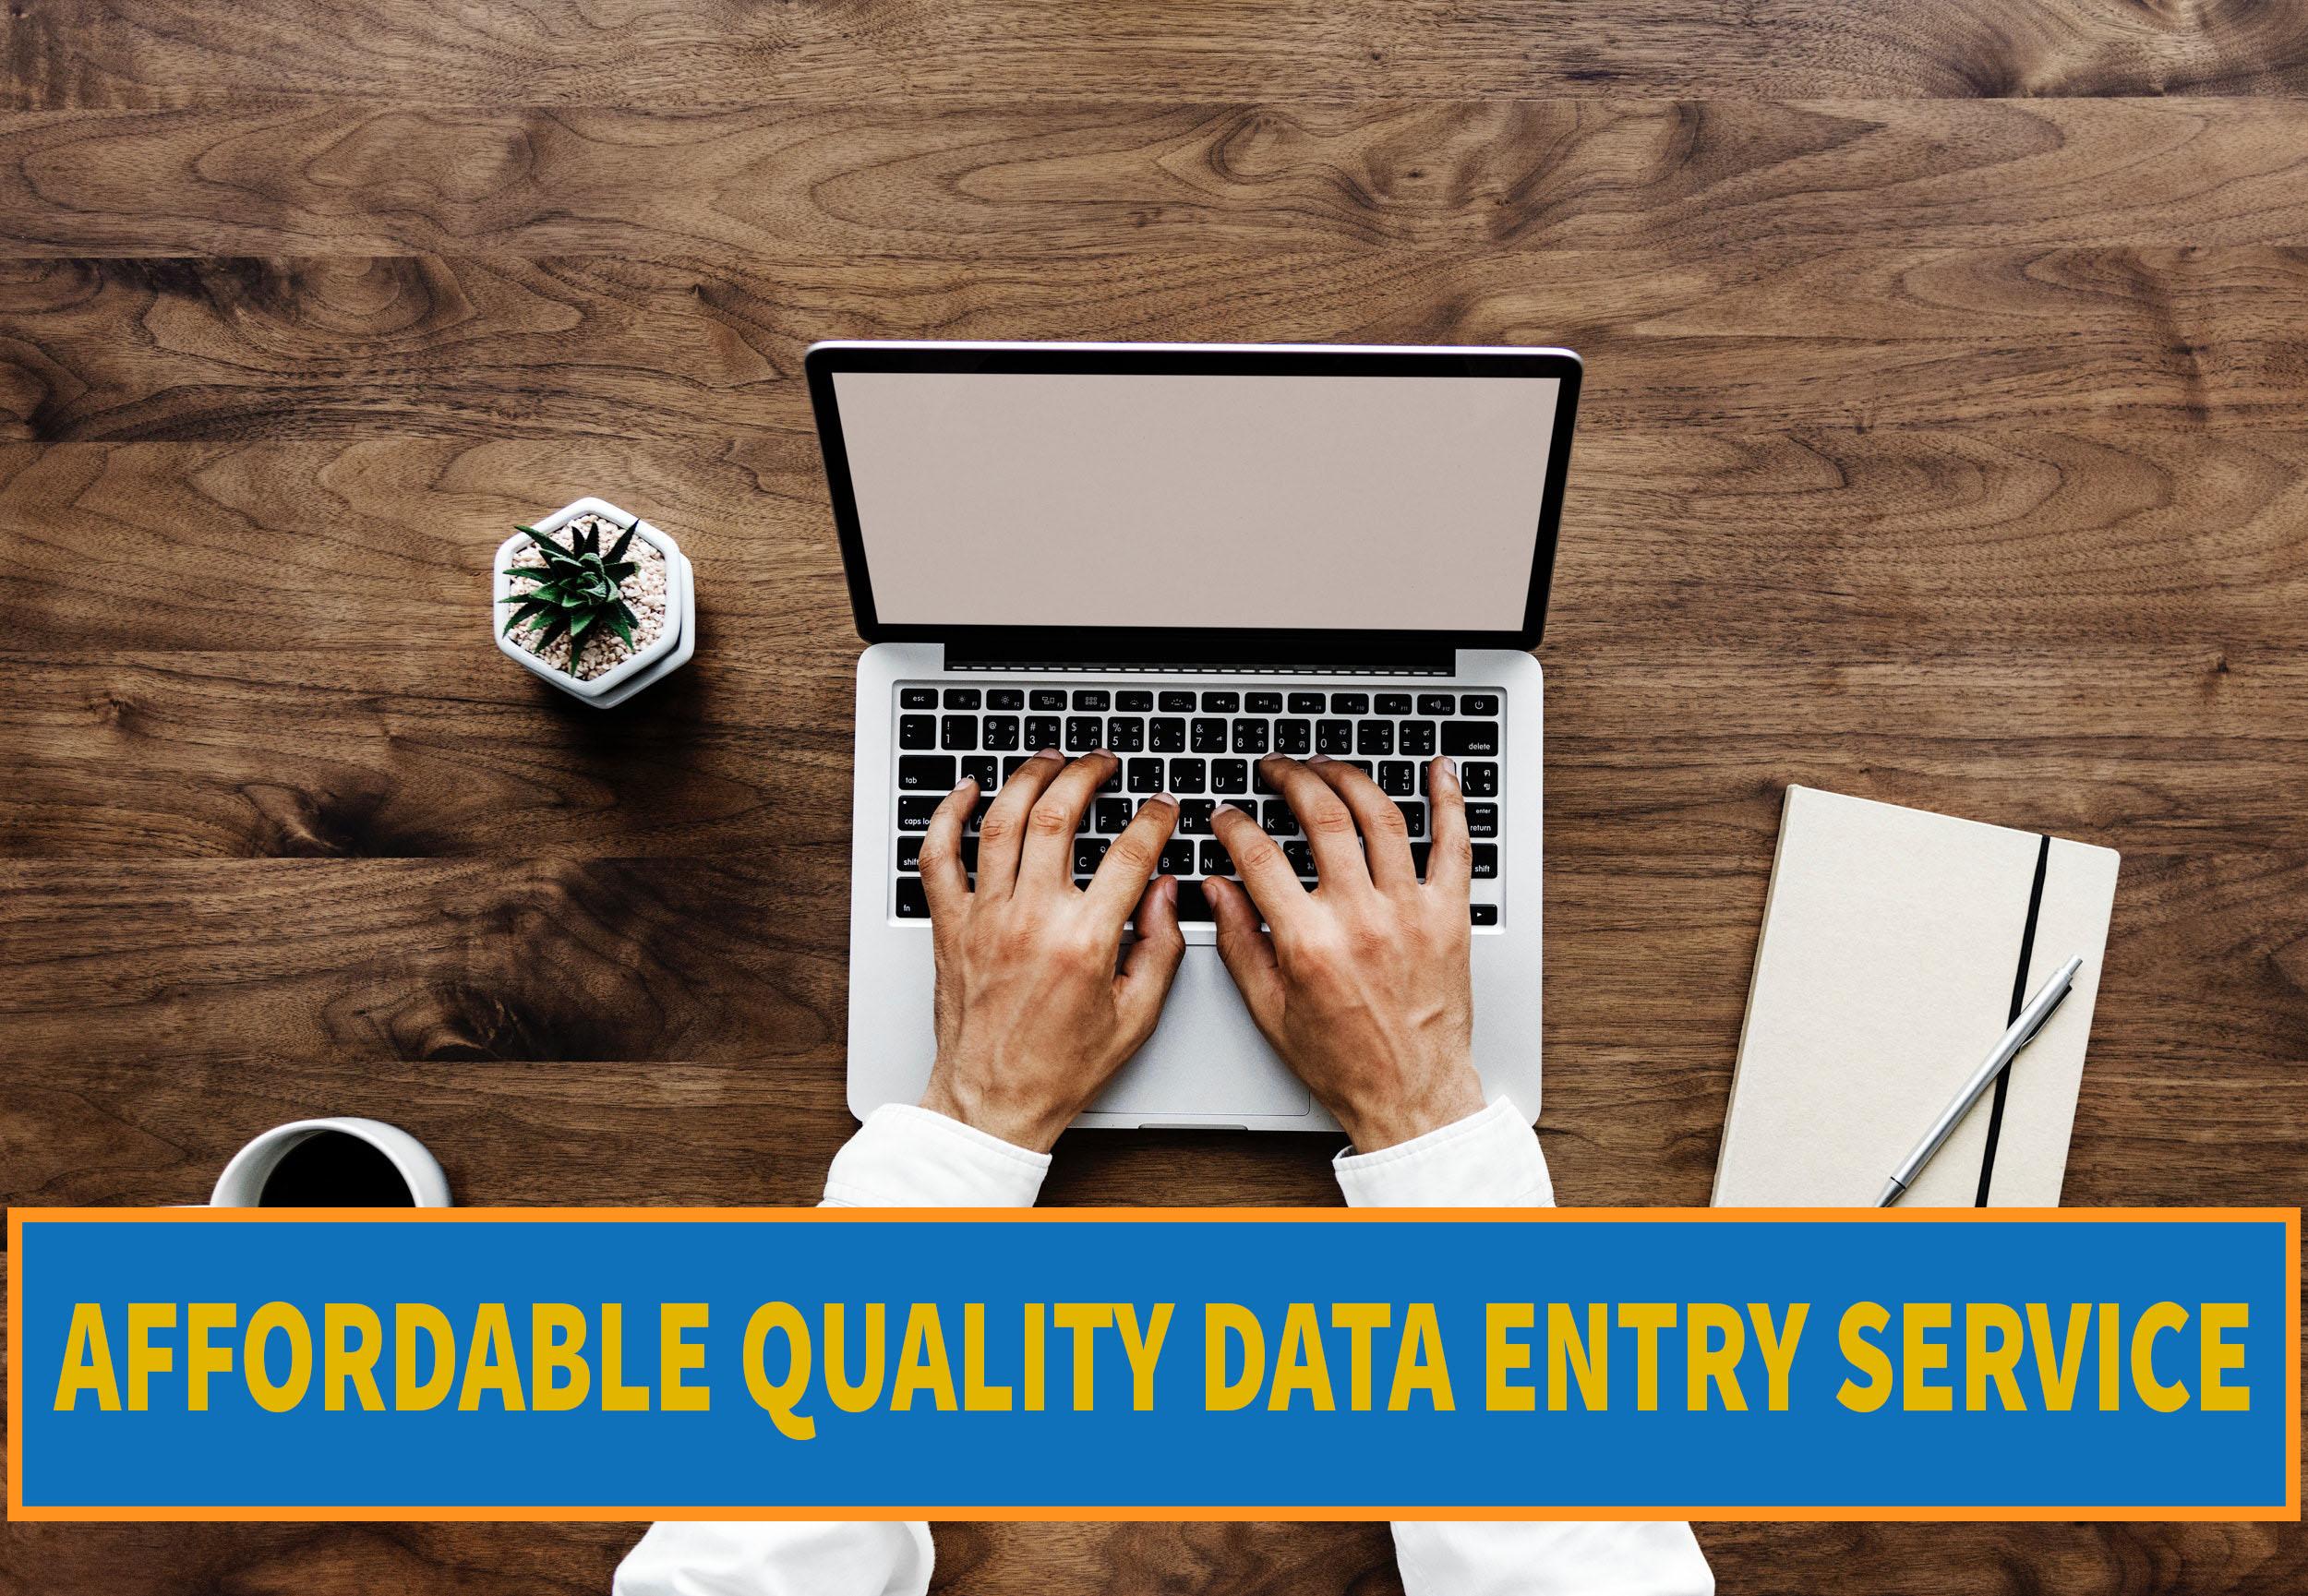 Affordable Data Entry Job